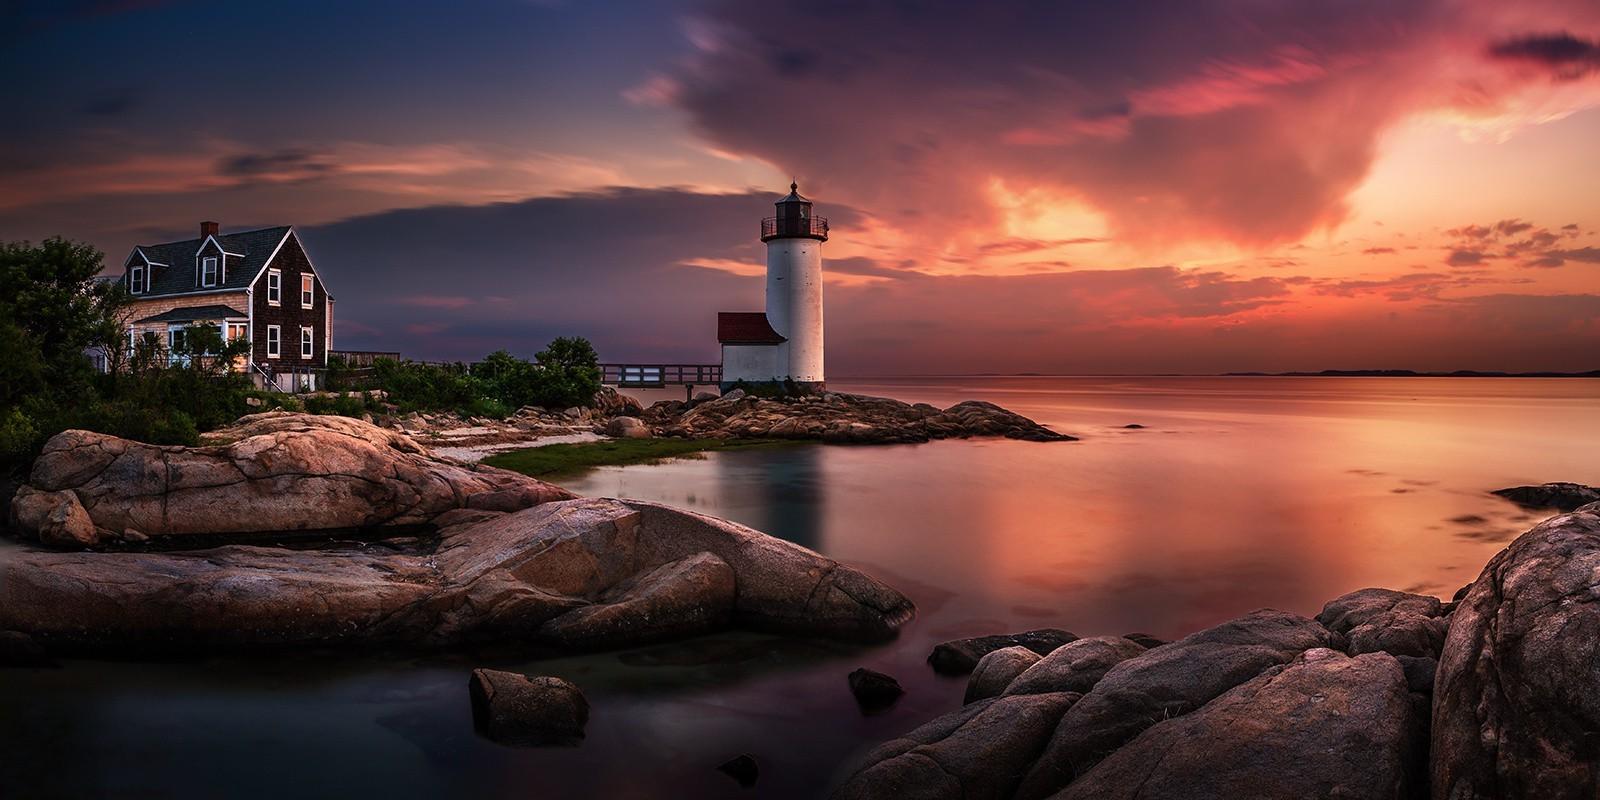 Uhd Wallpapers Fall Nature Landscape Sunset Lighthouse Massachusetts Sky